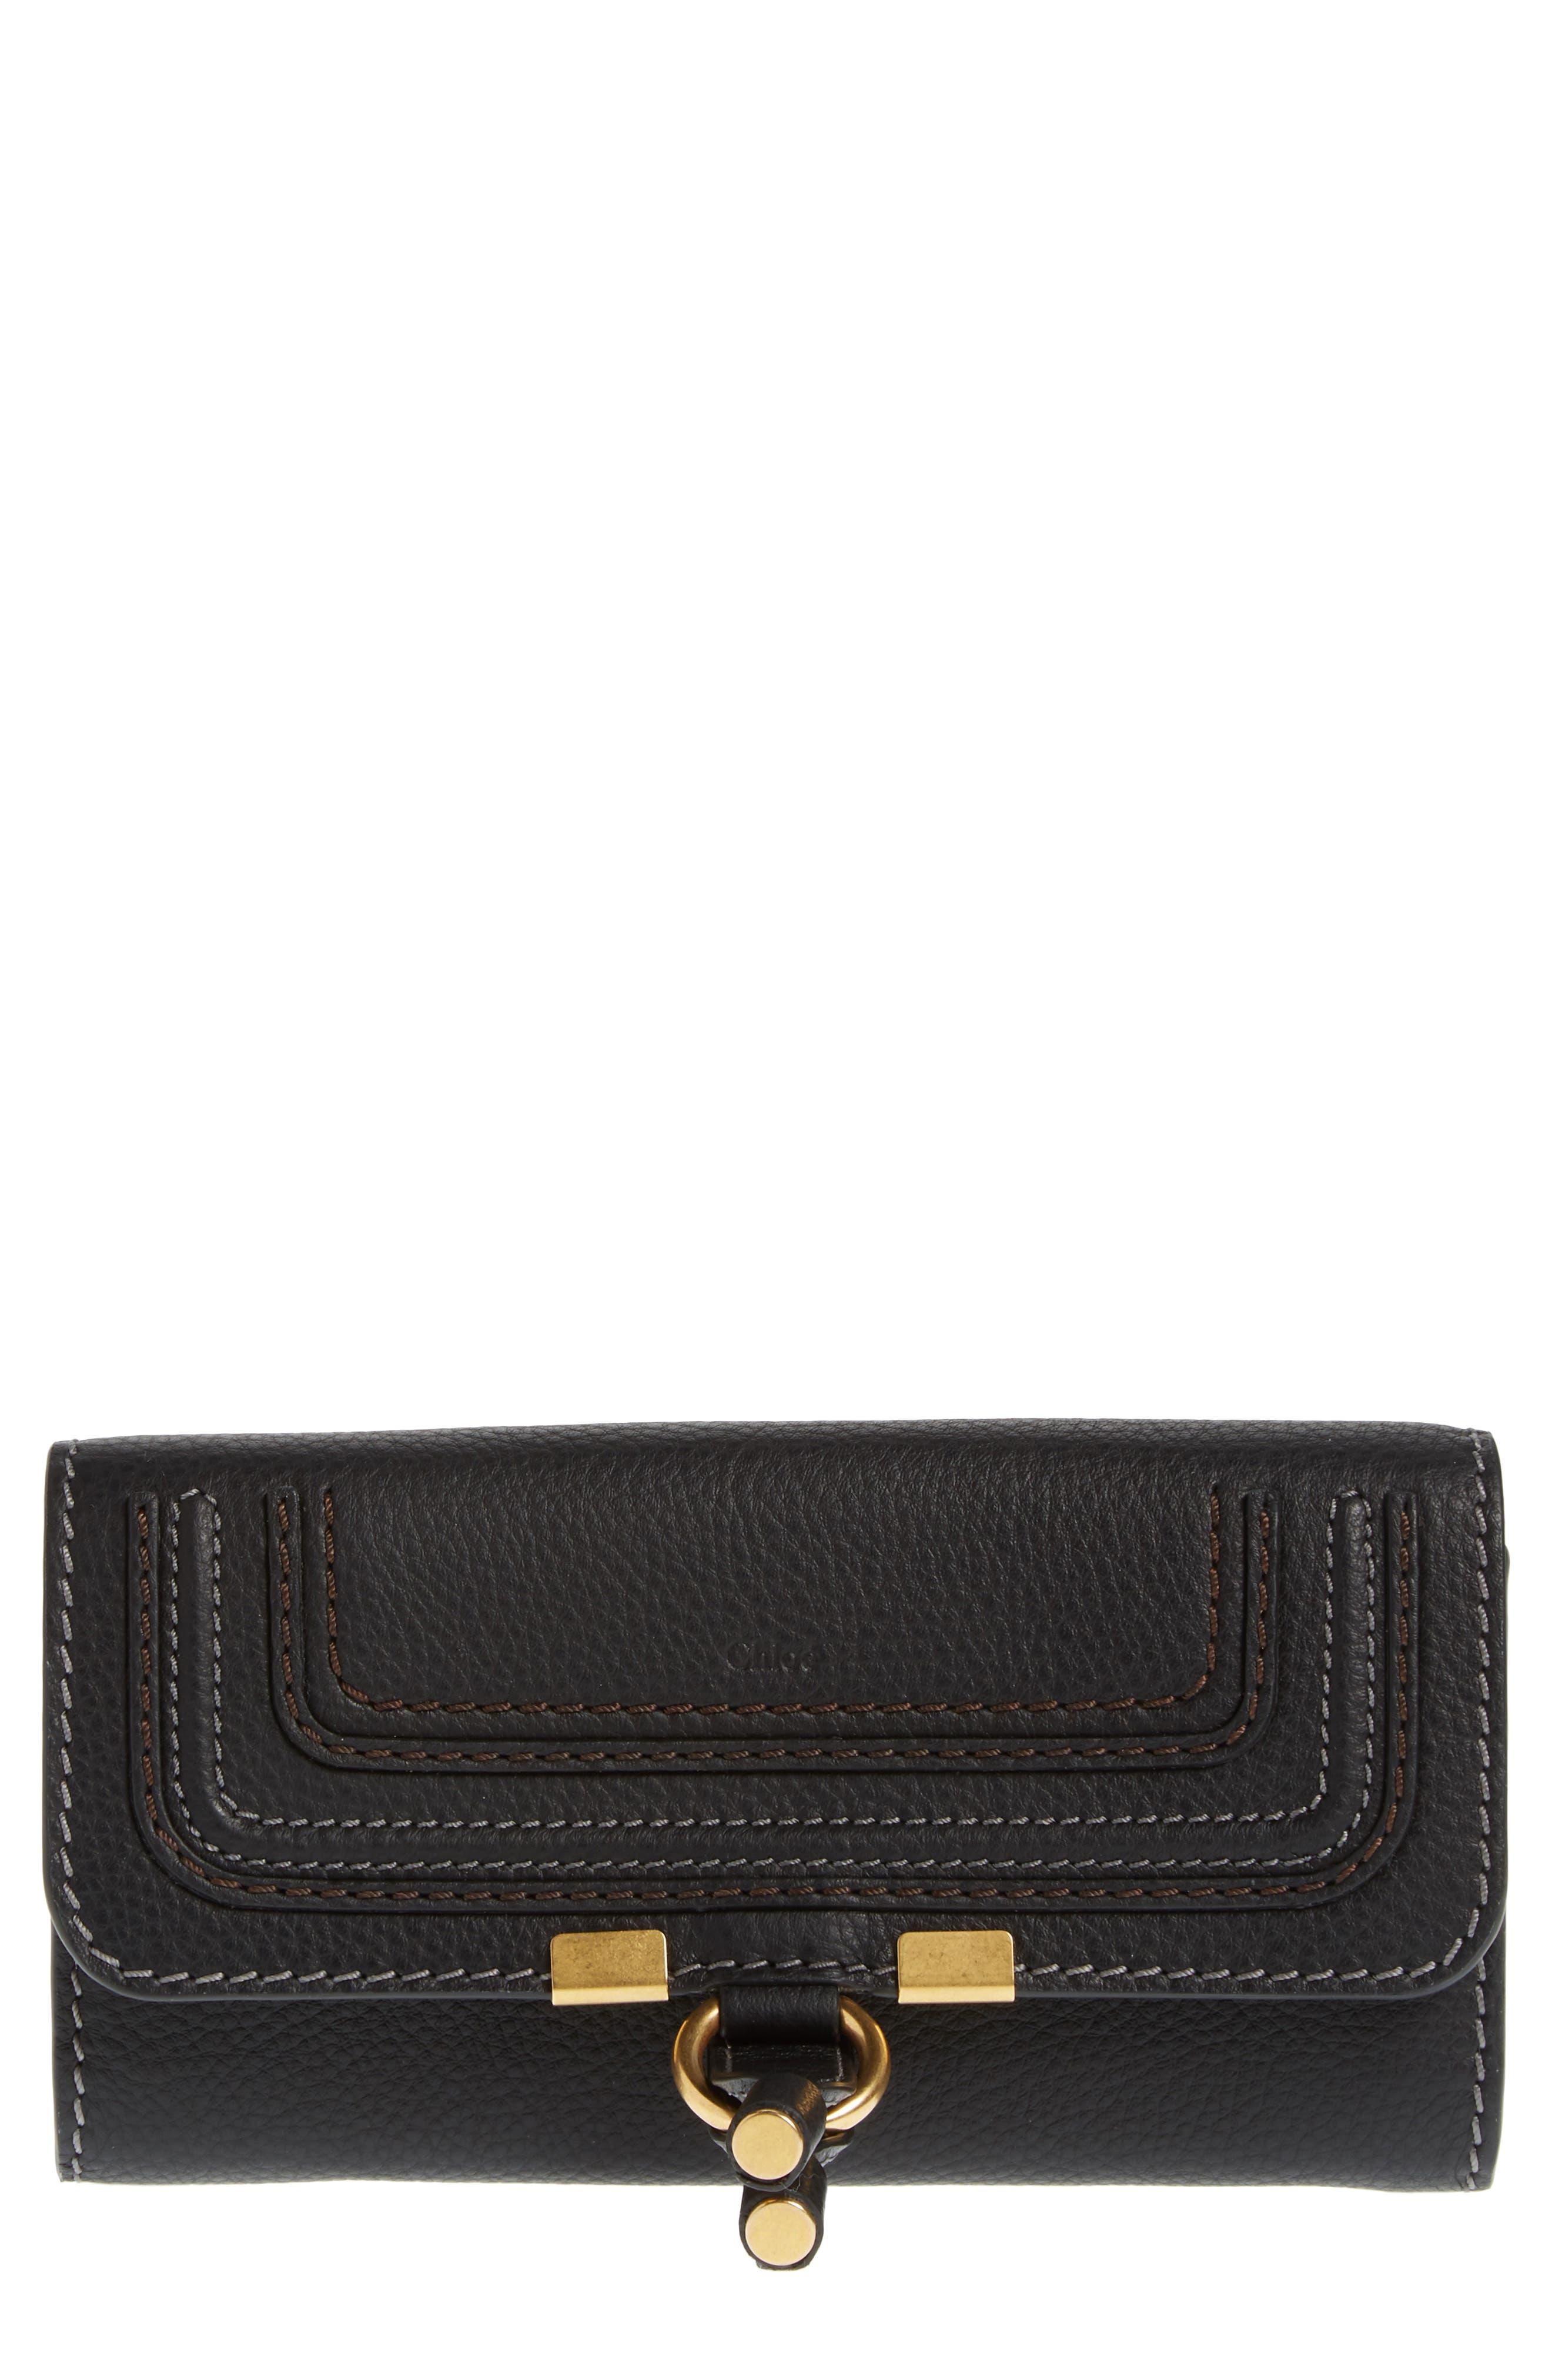 Marcie - Long Leather Flap Wallet,                             Main thumbnail 1, color,                             BLACK